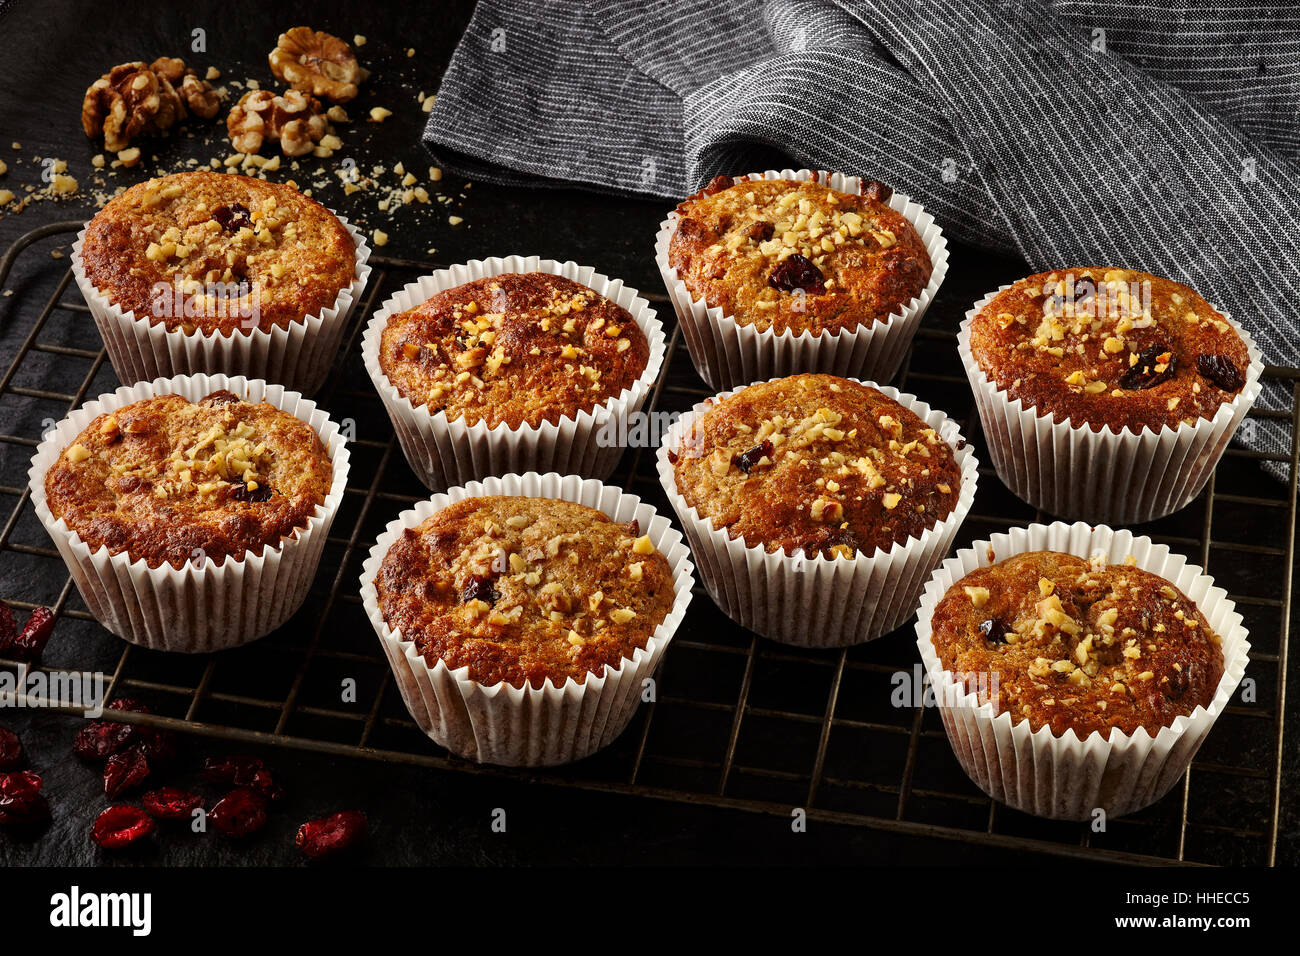 Cranberry walnut muffins - Stock Image